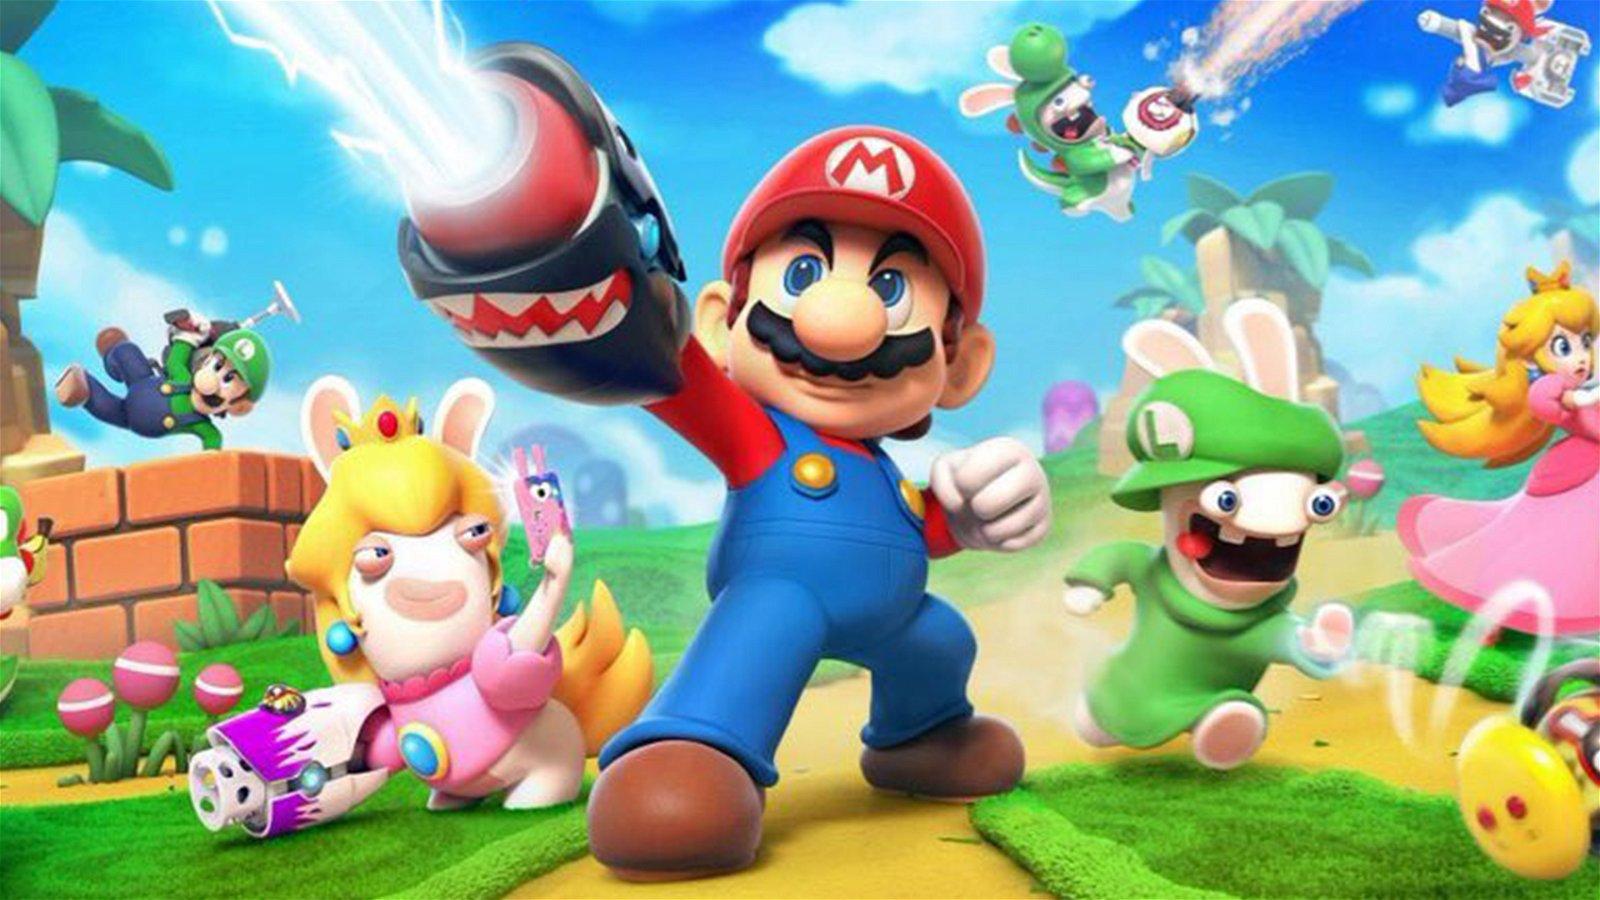 Mario + Rabbids Sparks of Hope Rumoured After ResetEra Leak 1